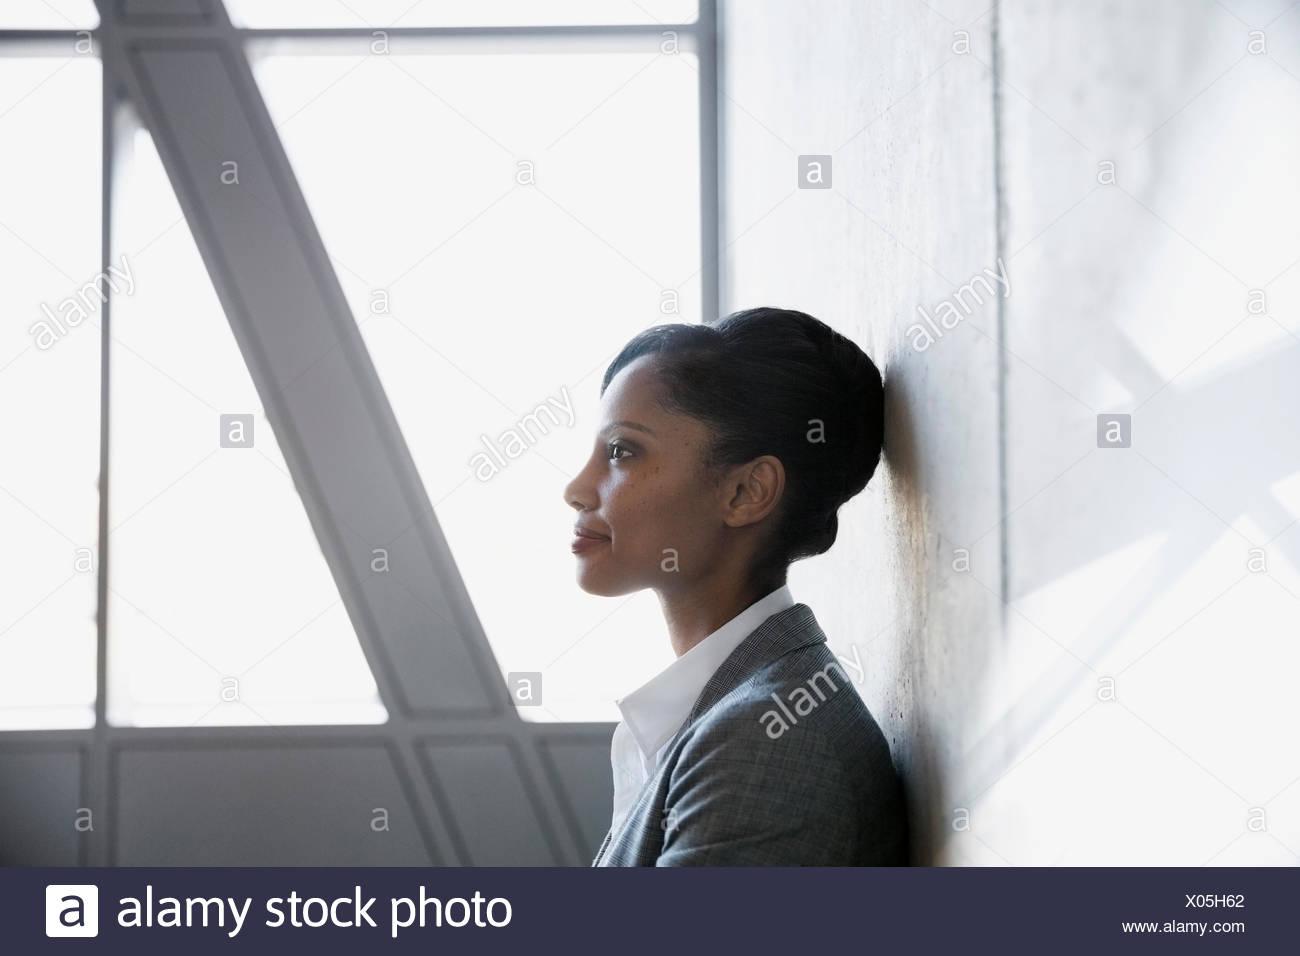 Perfil pensativo empresaria con cabello negro en busca de distancia Imagen De Stock